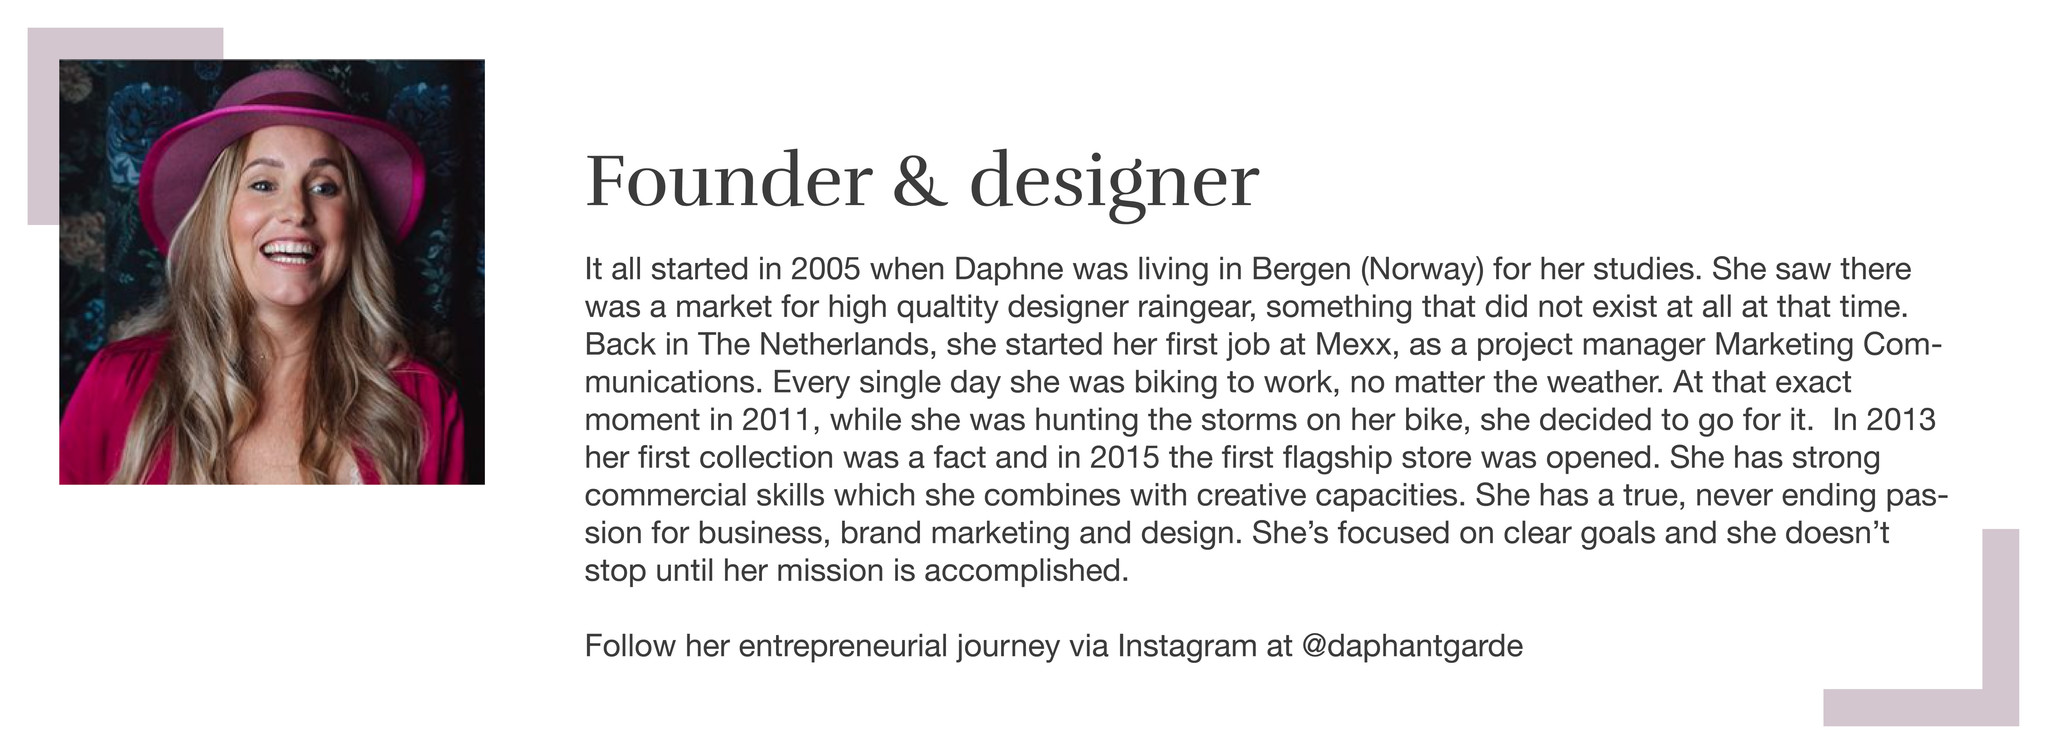 Founder Daphne